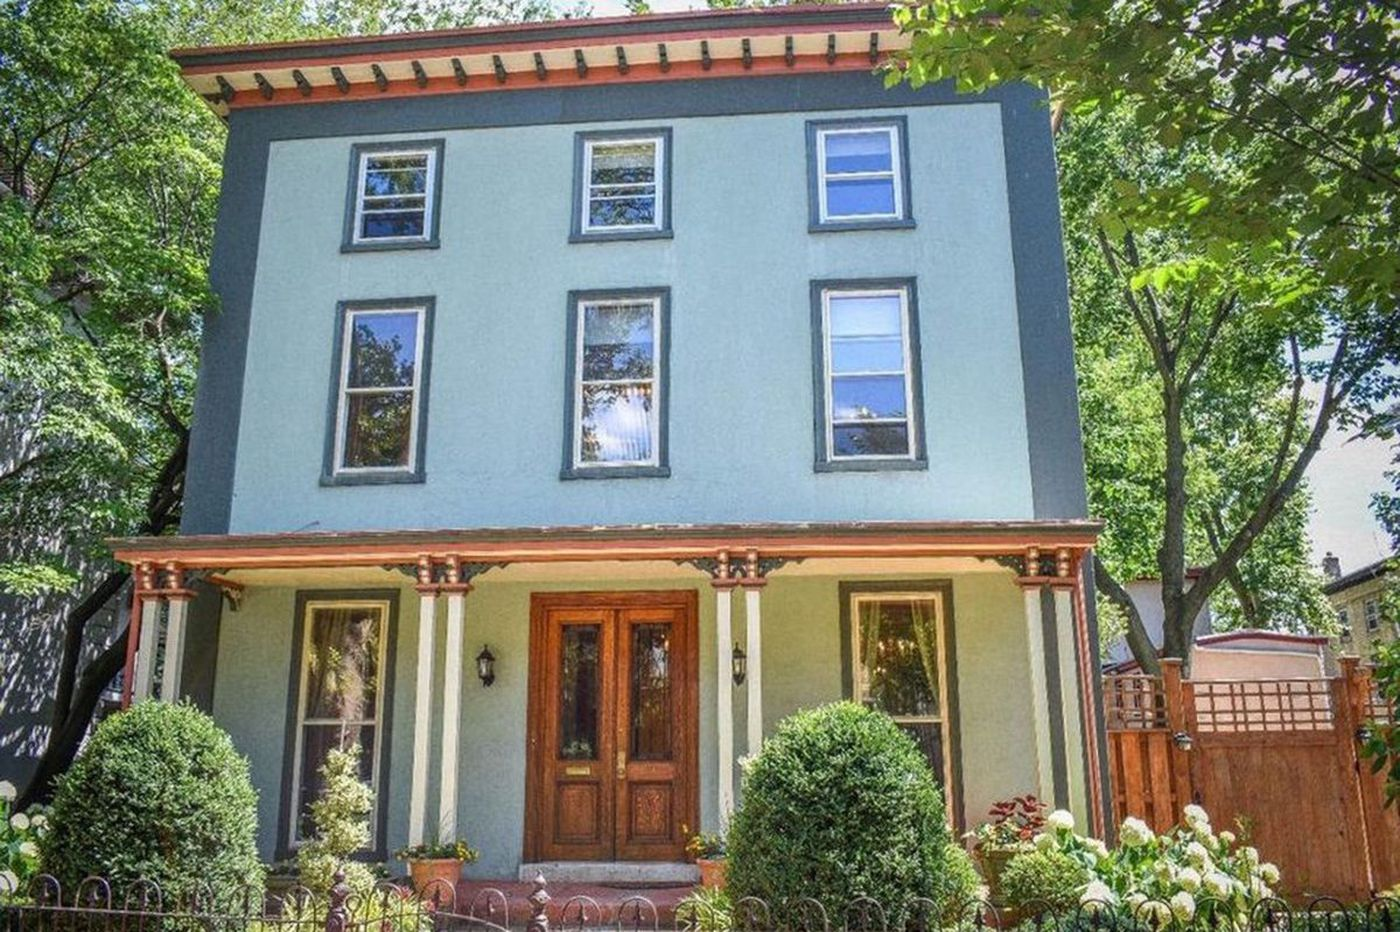 On The Market: Six-bedroom Powelton gem in 'Hyde Park' of Philadelphia